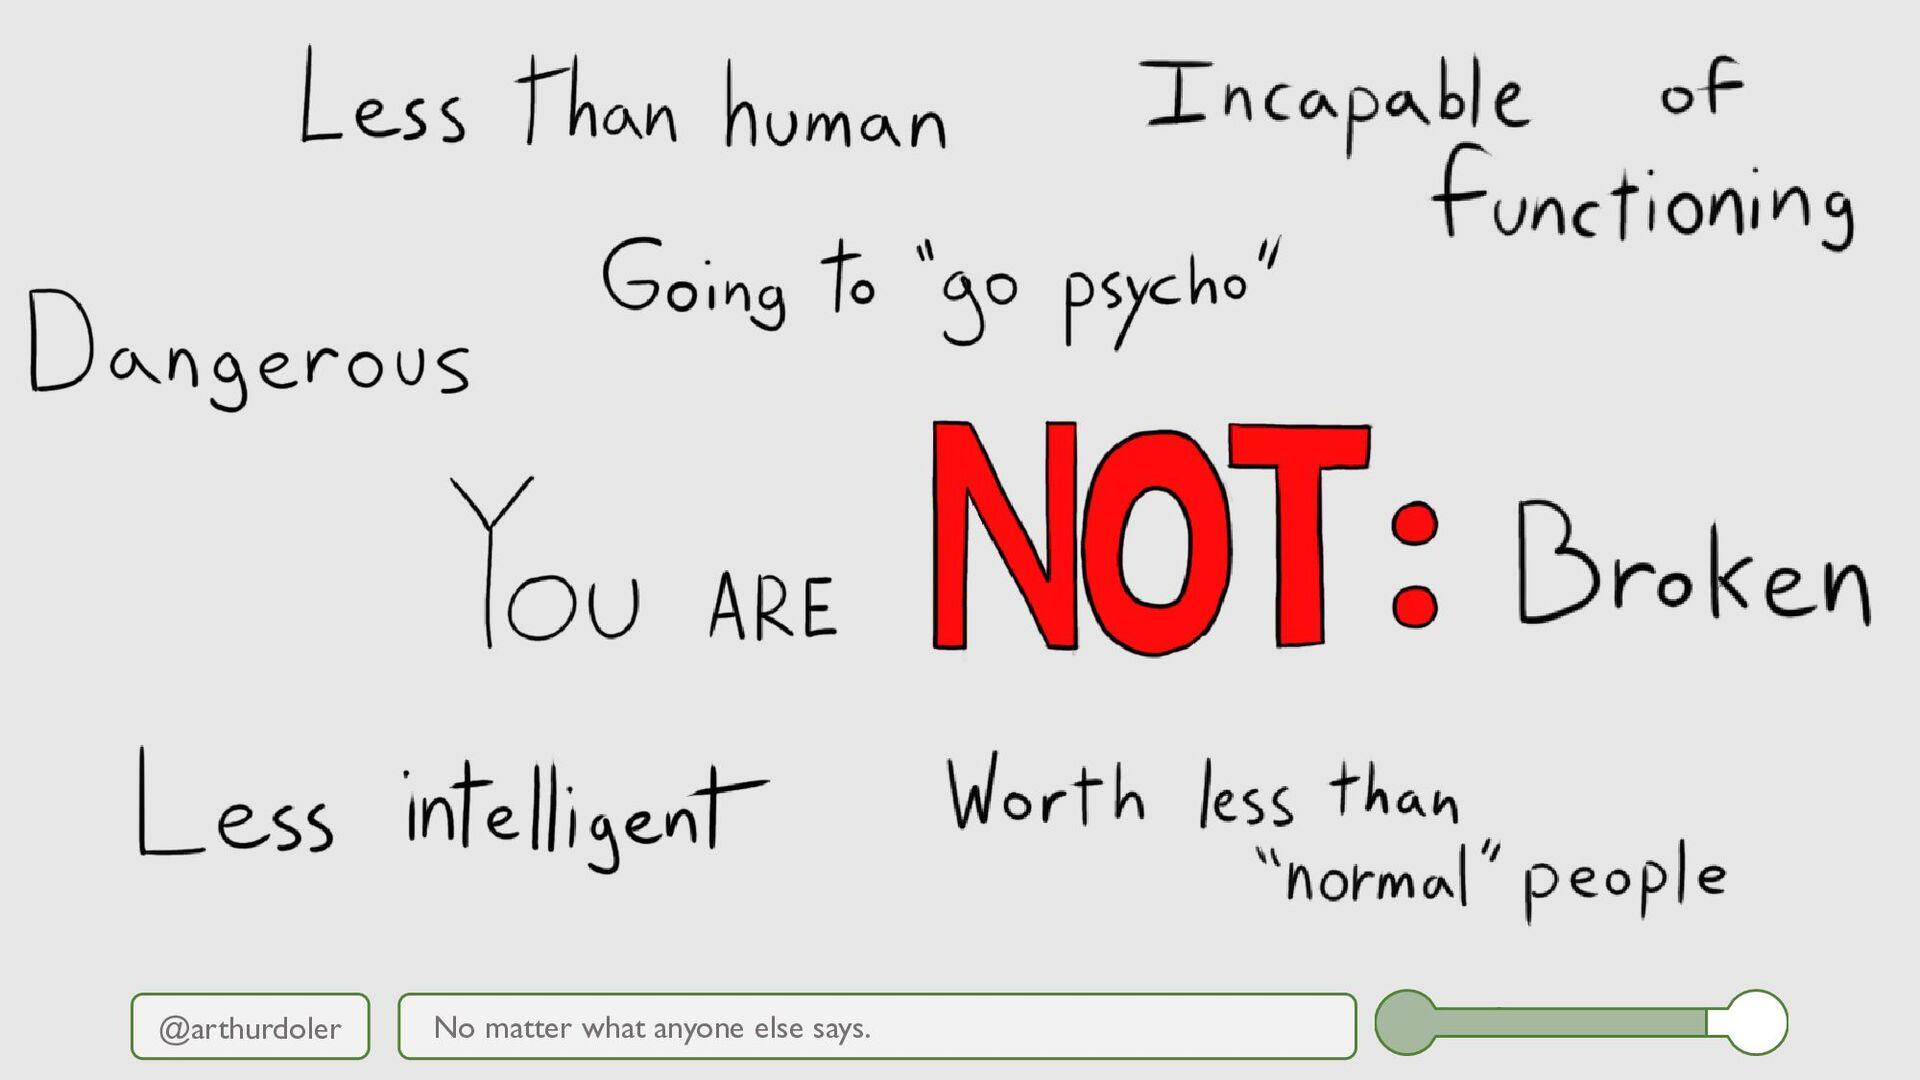 @arthurdoler No matter what anyone else says.